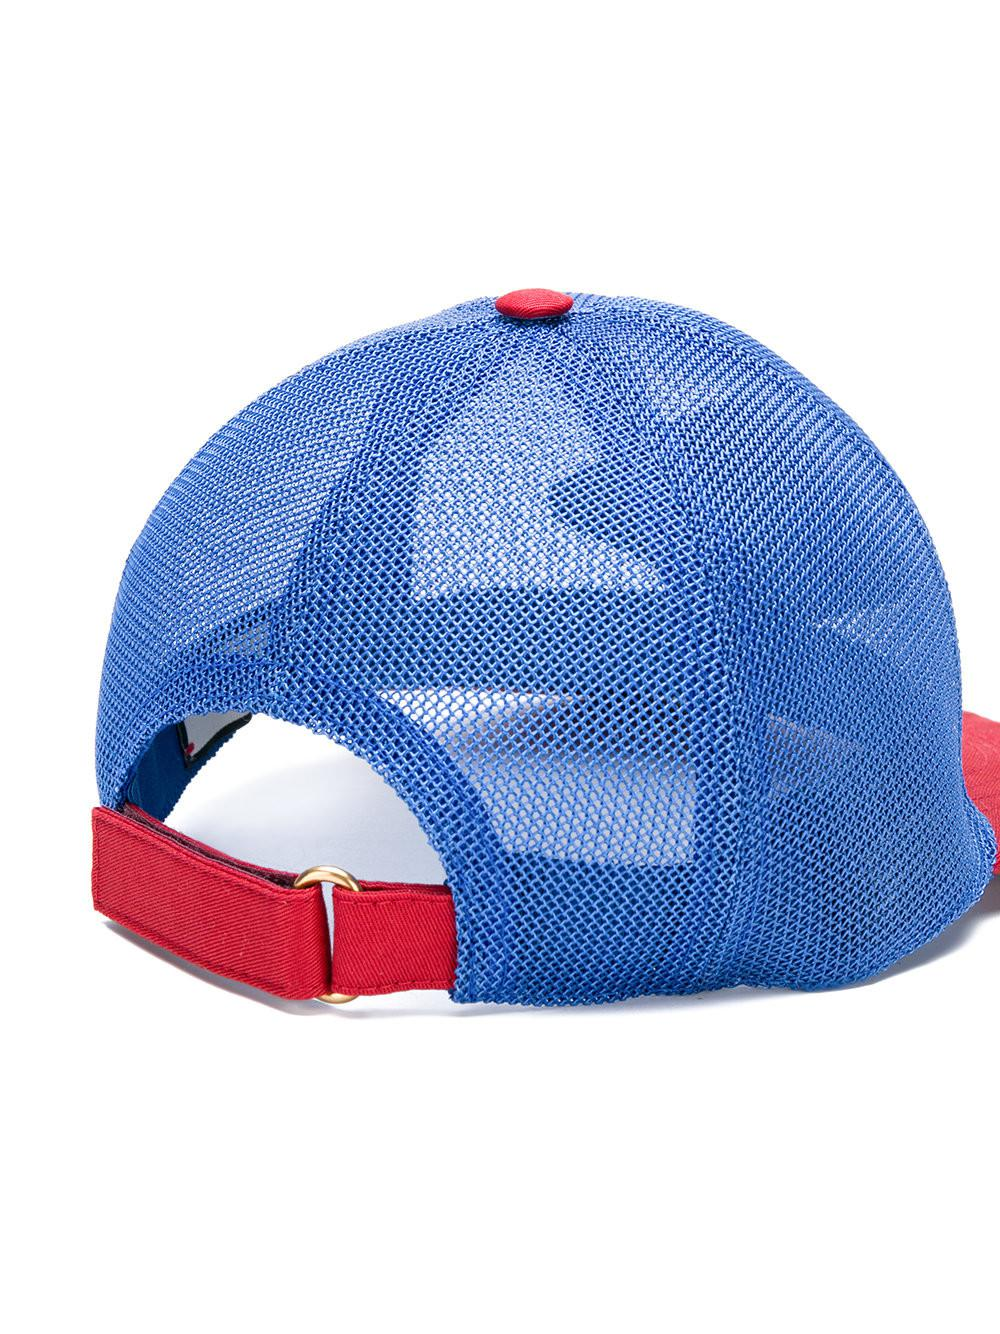 Lyst - Gucci Mesh Baseball Bat in Blue for Men - Save 39% b96d2927ce06